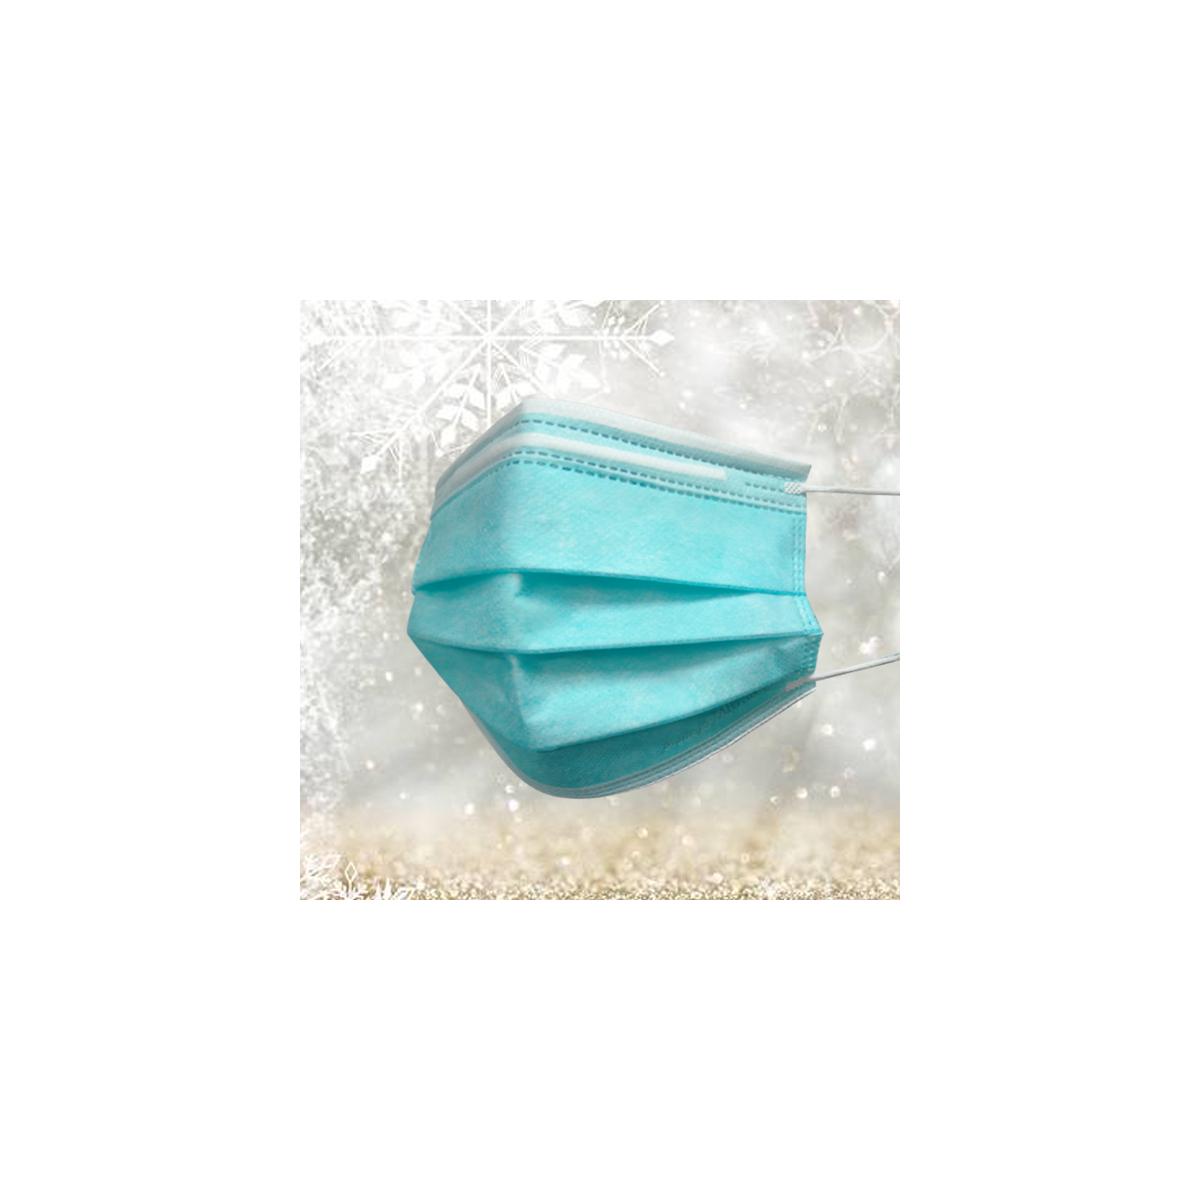 Masque bleu turquoise